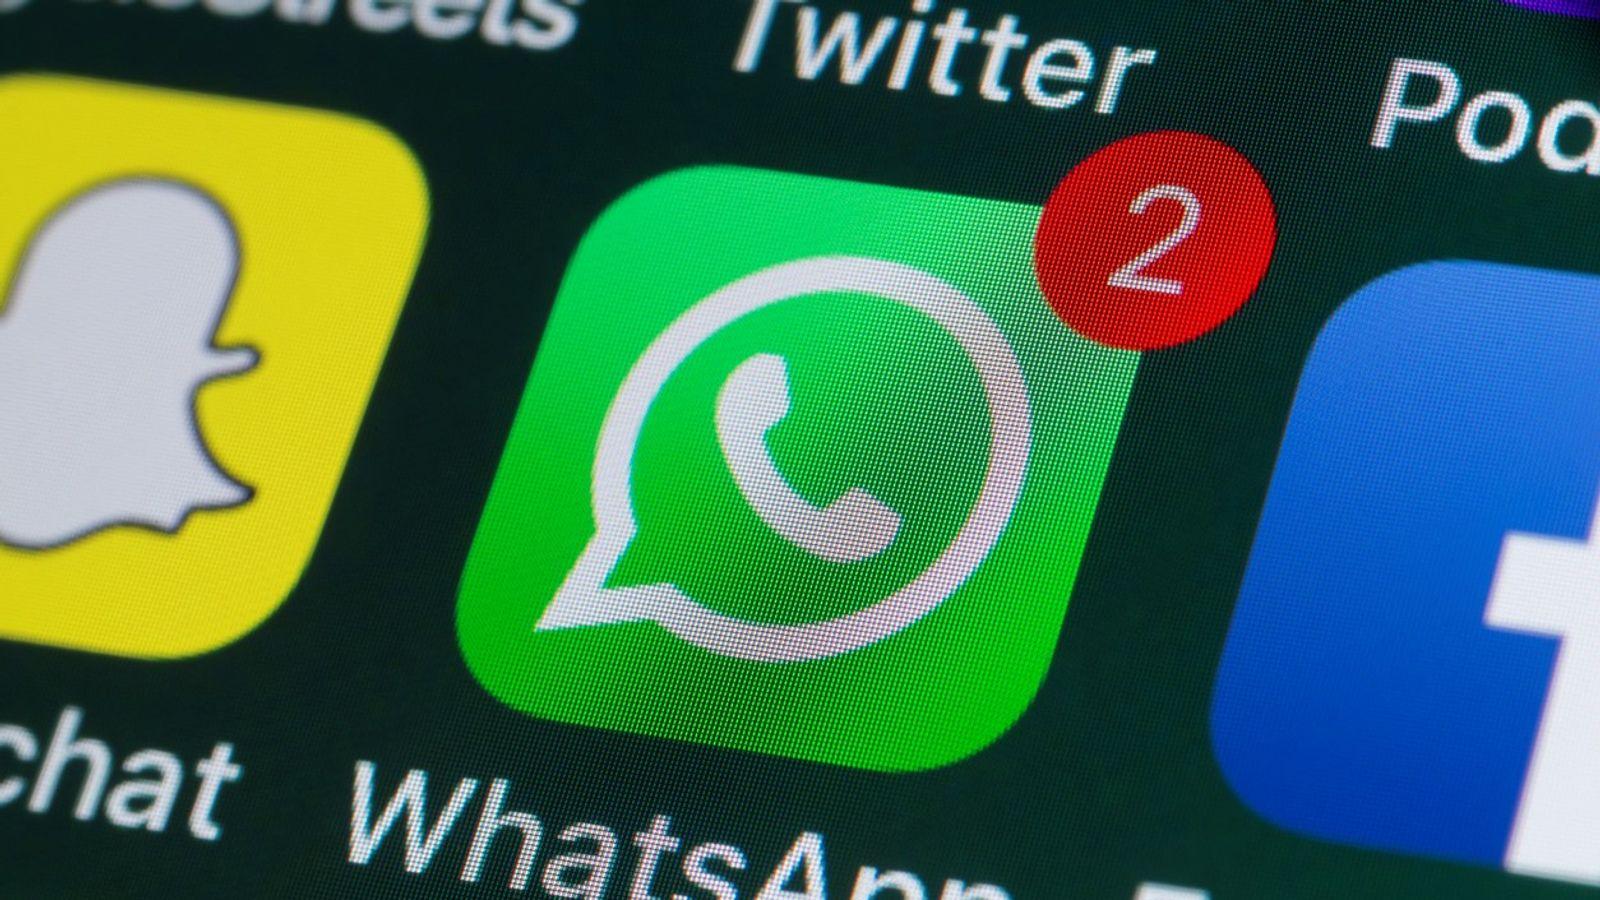 WhatsApp confirms cyber surveillance attack